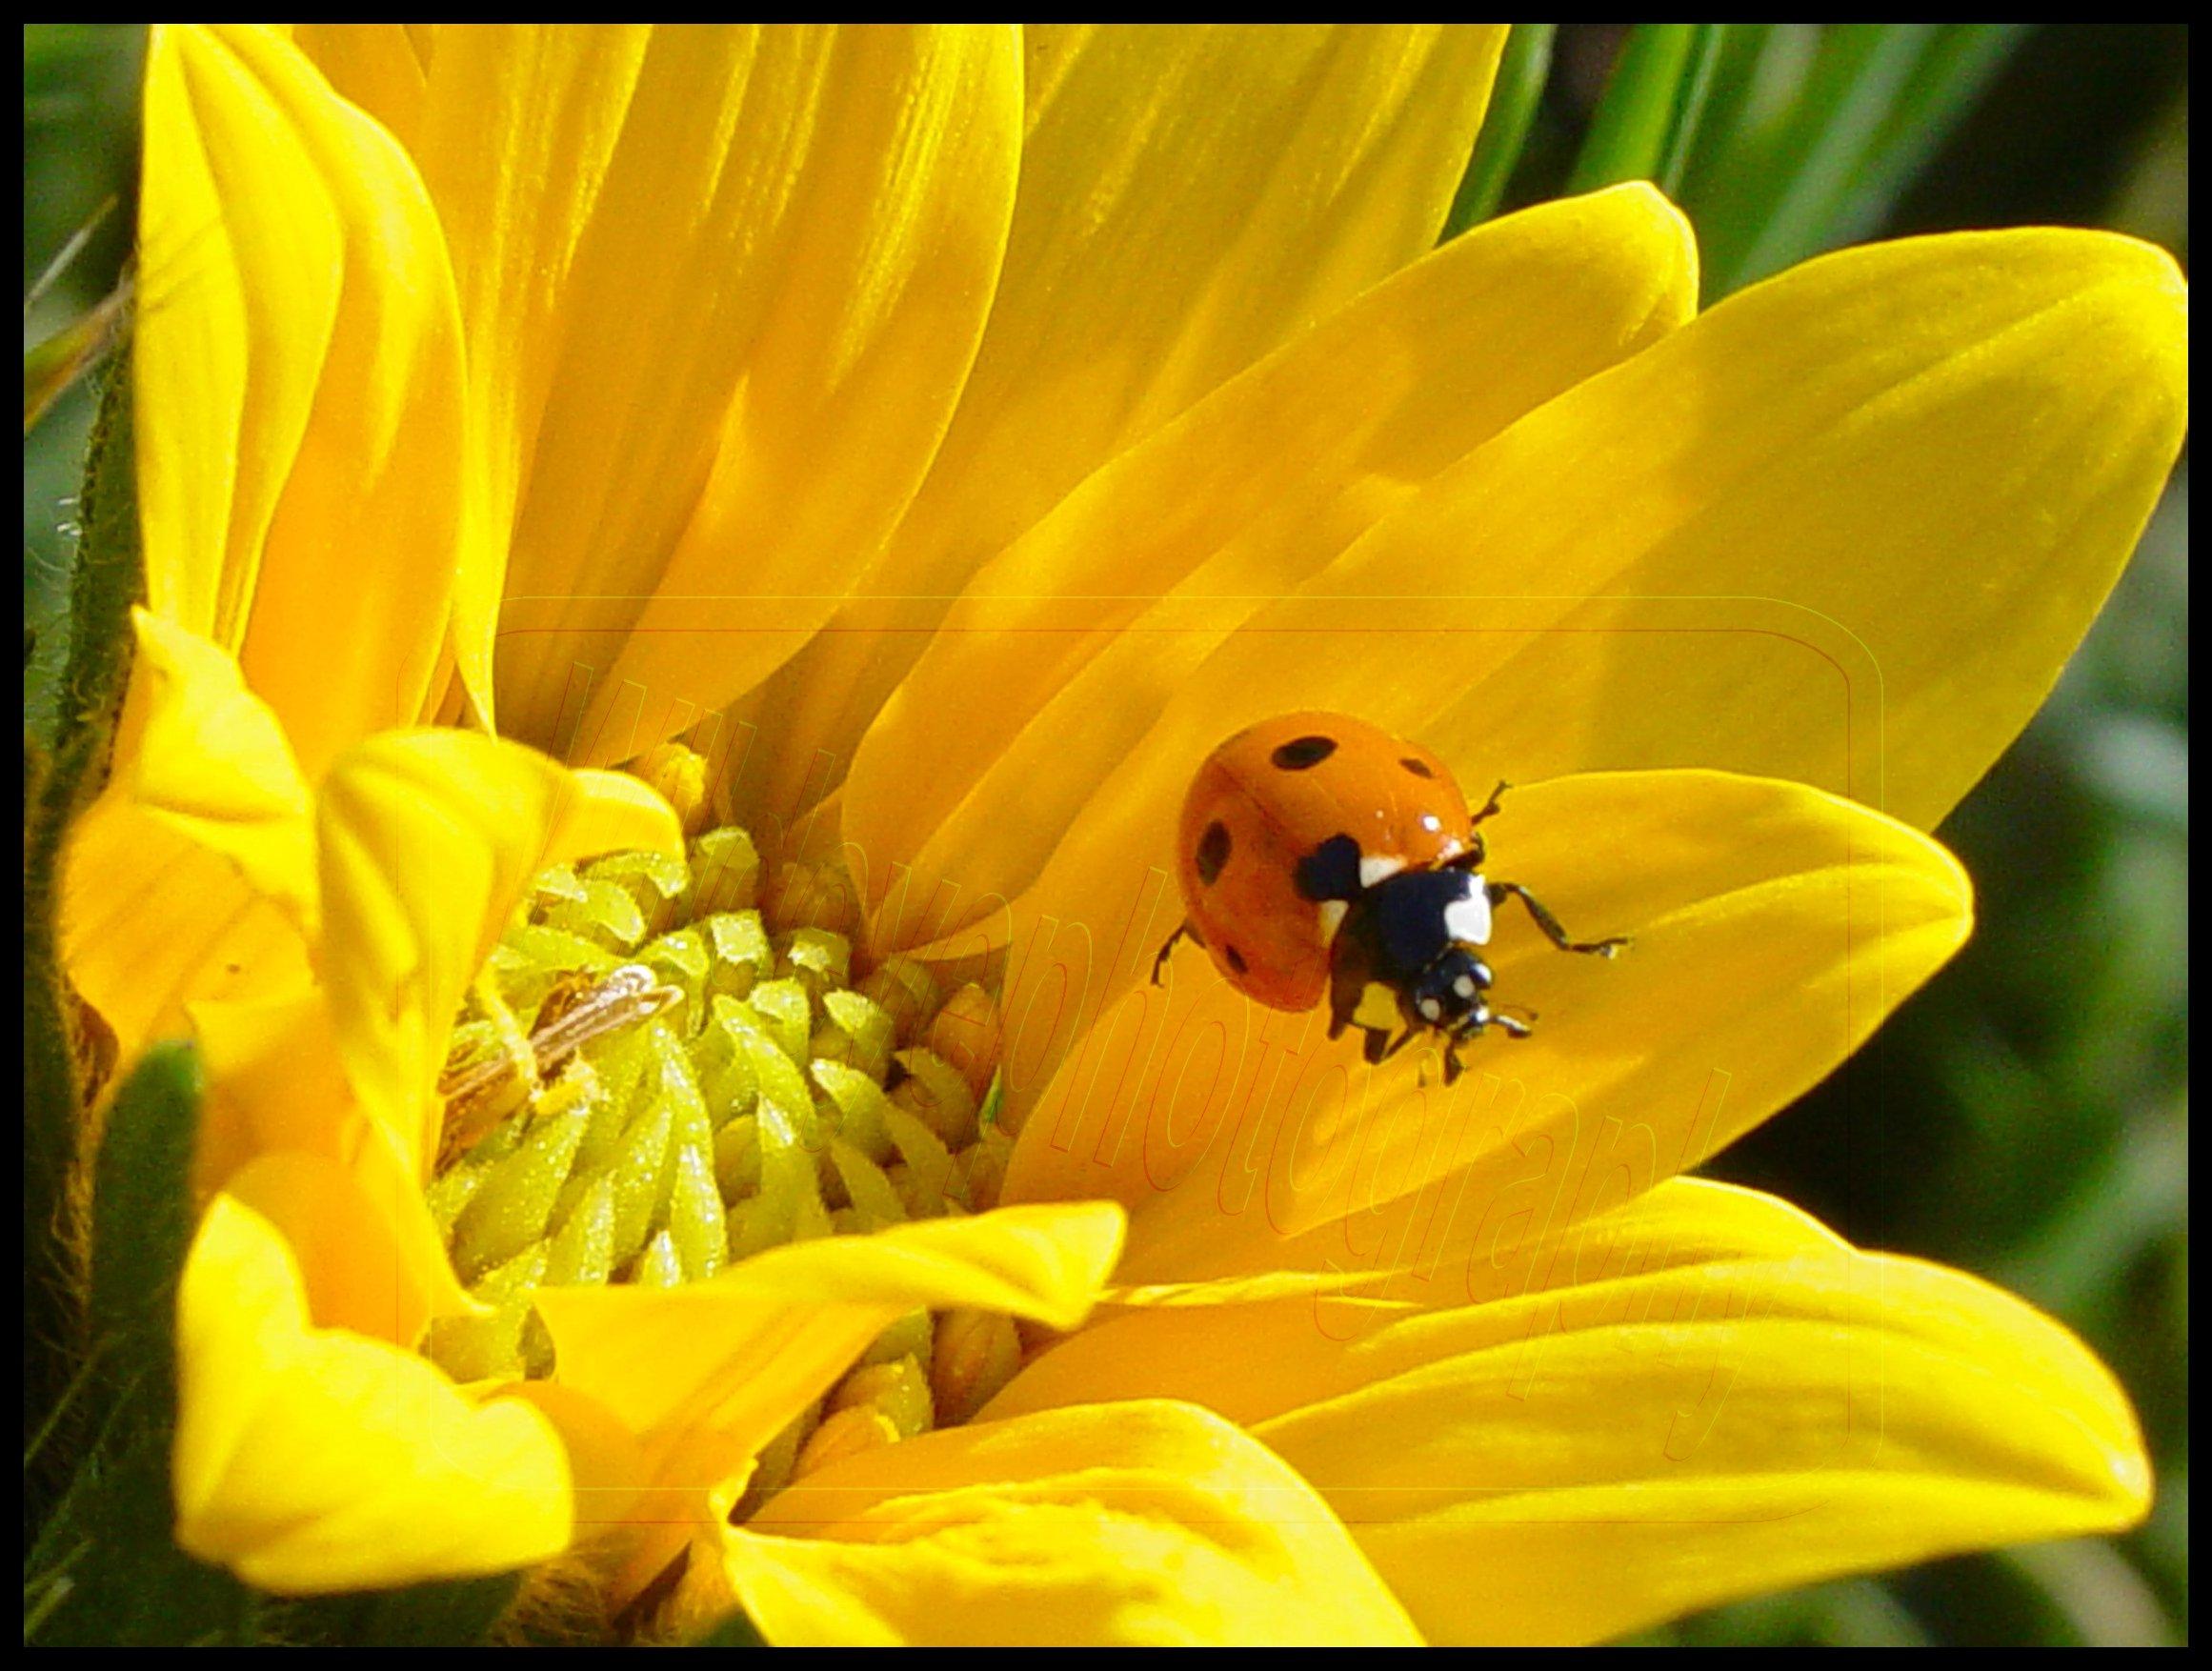 beautiful ladybugs - Ladybugs Photo (32774647) - Fanpop